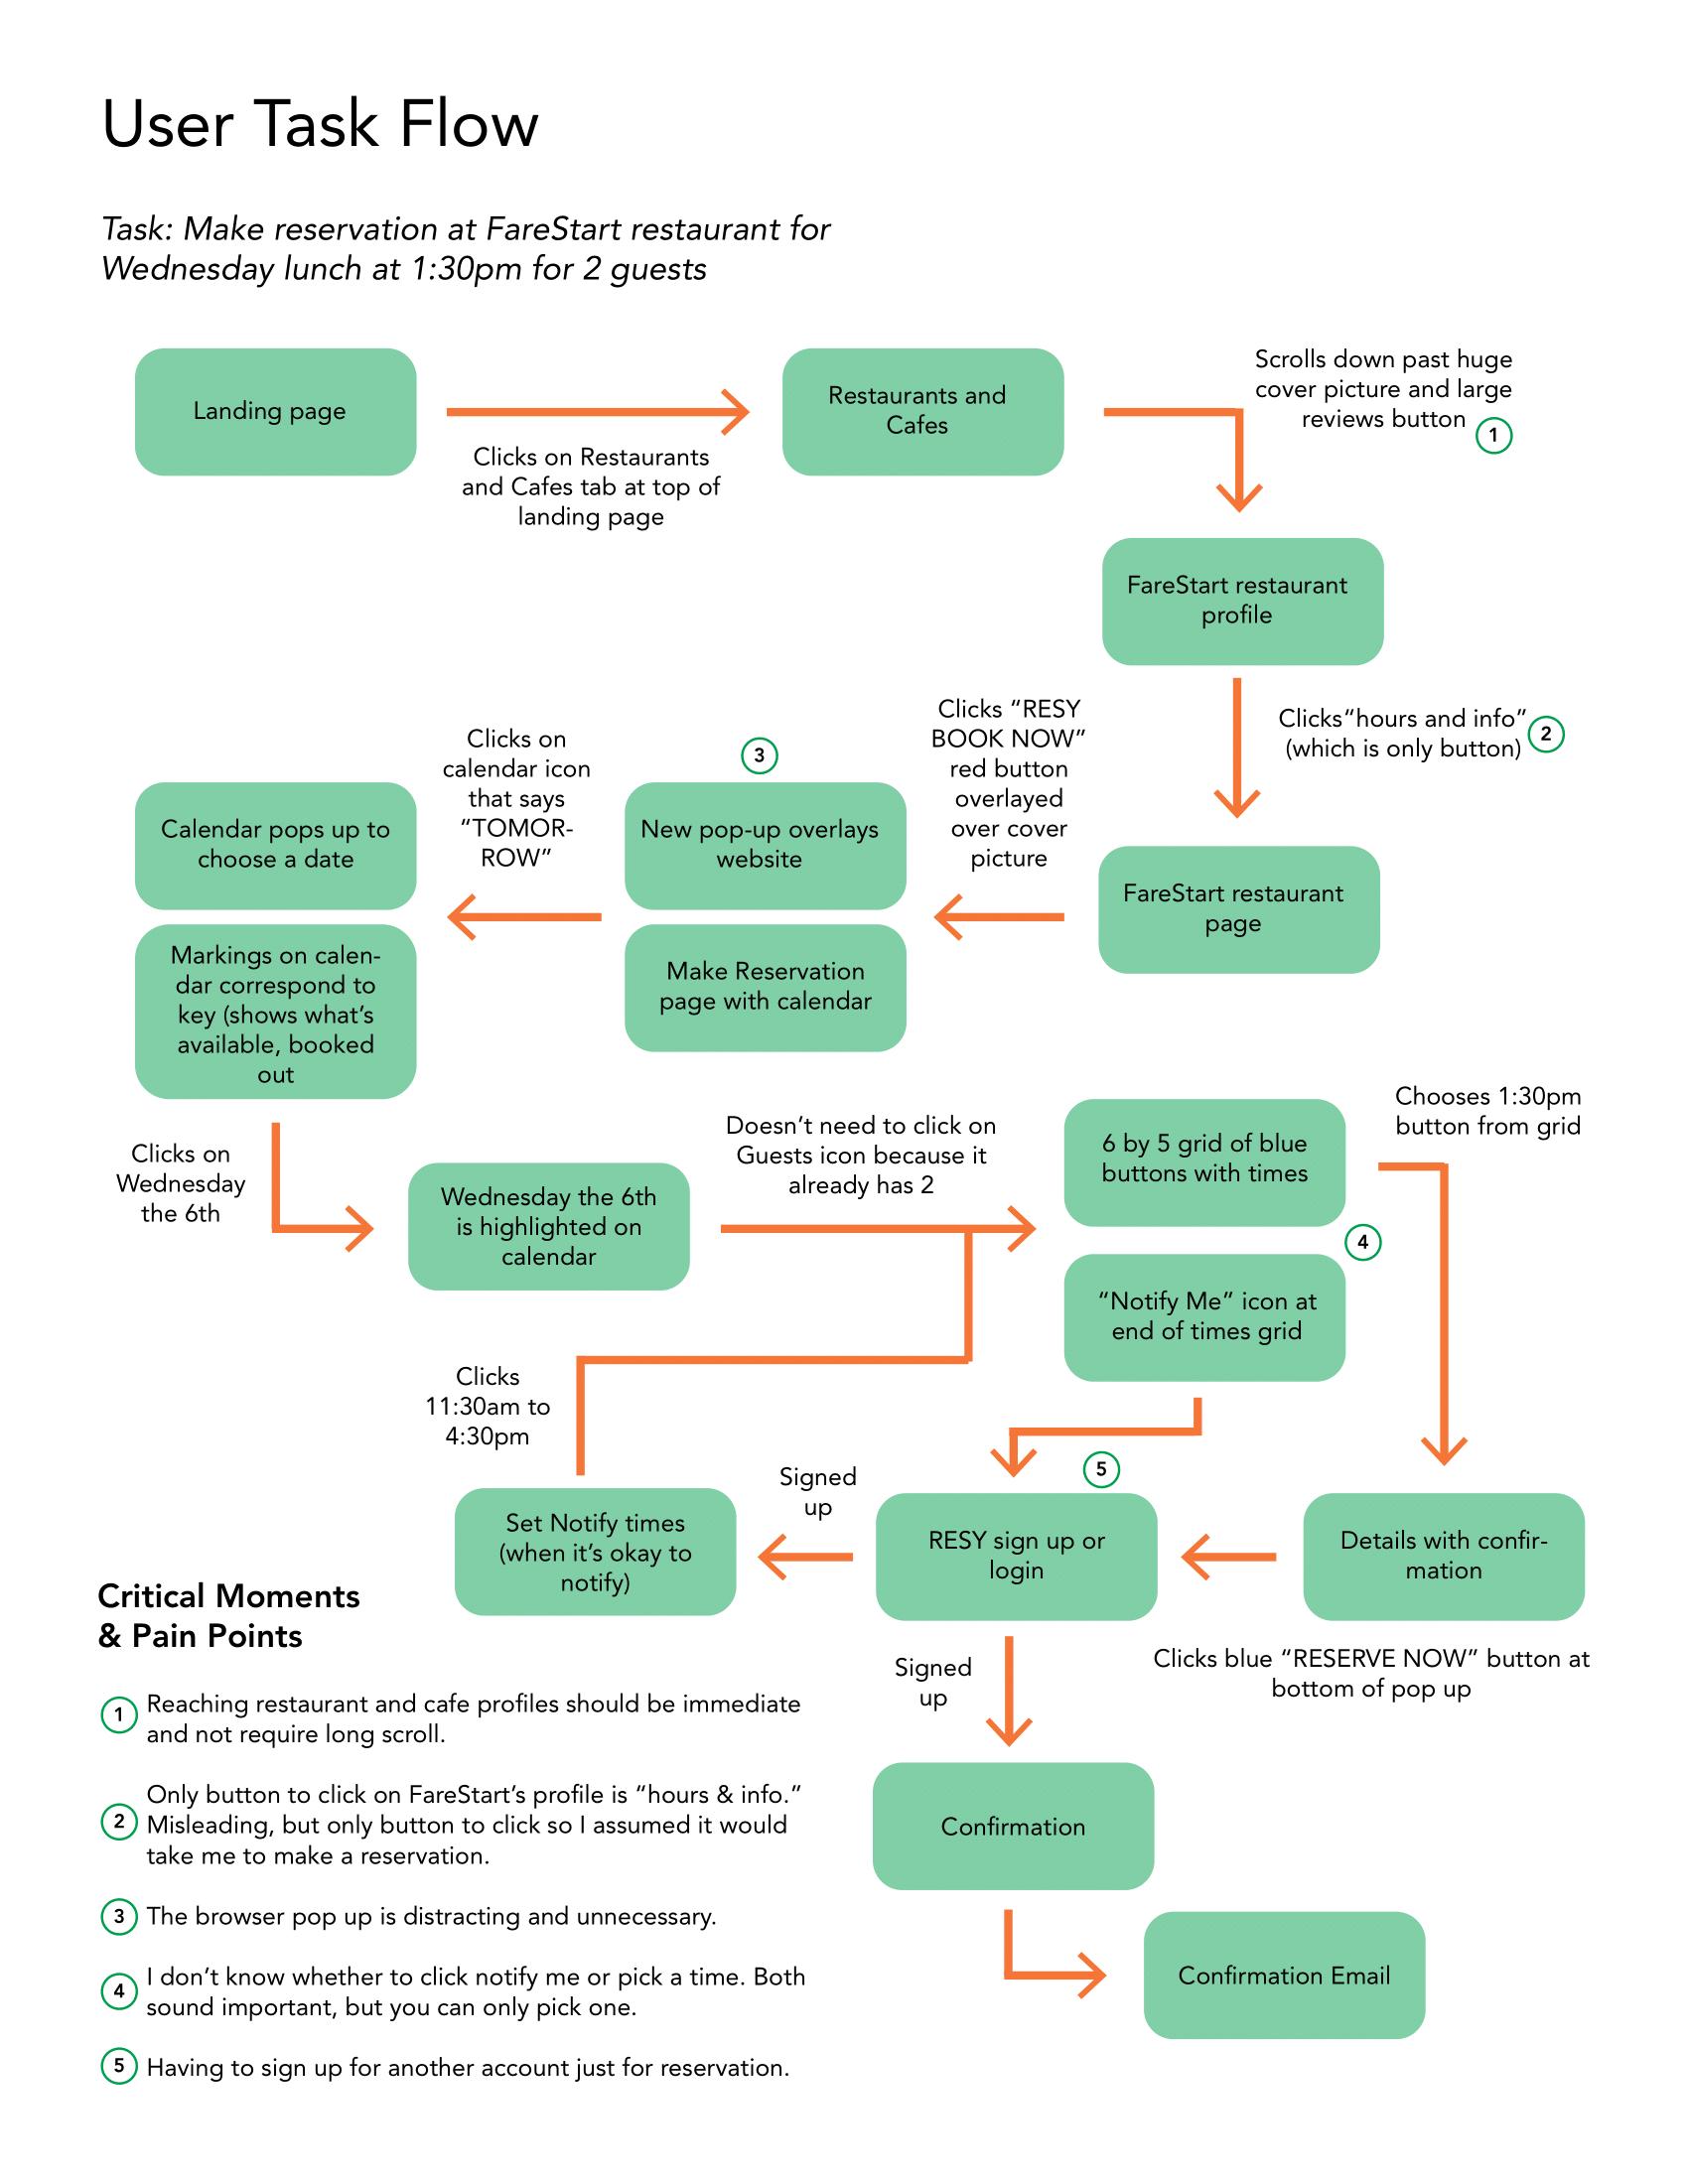 taskflow diagram